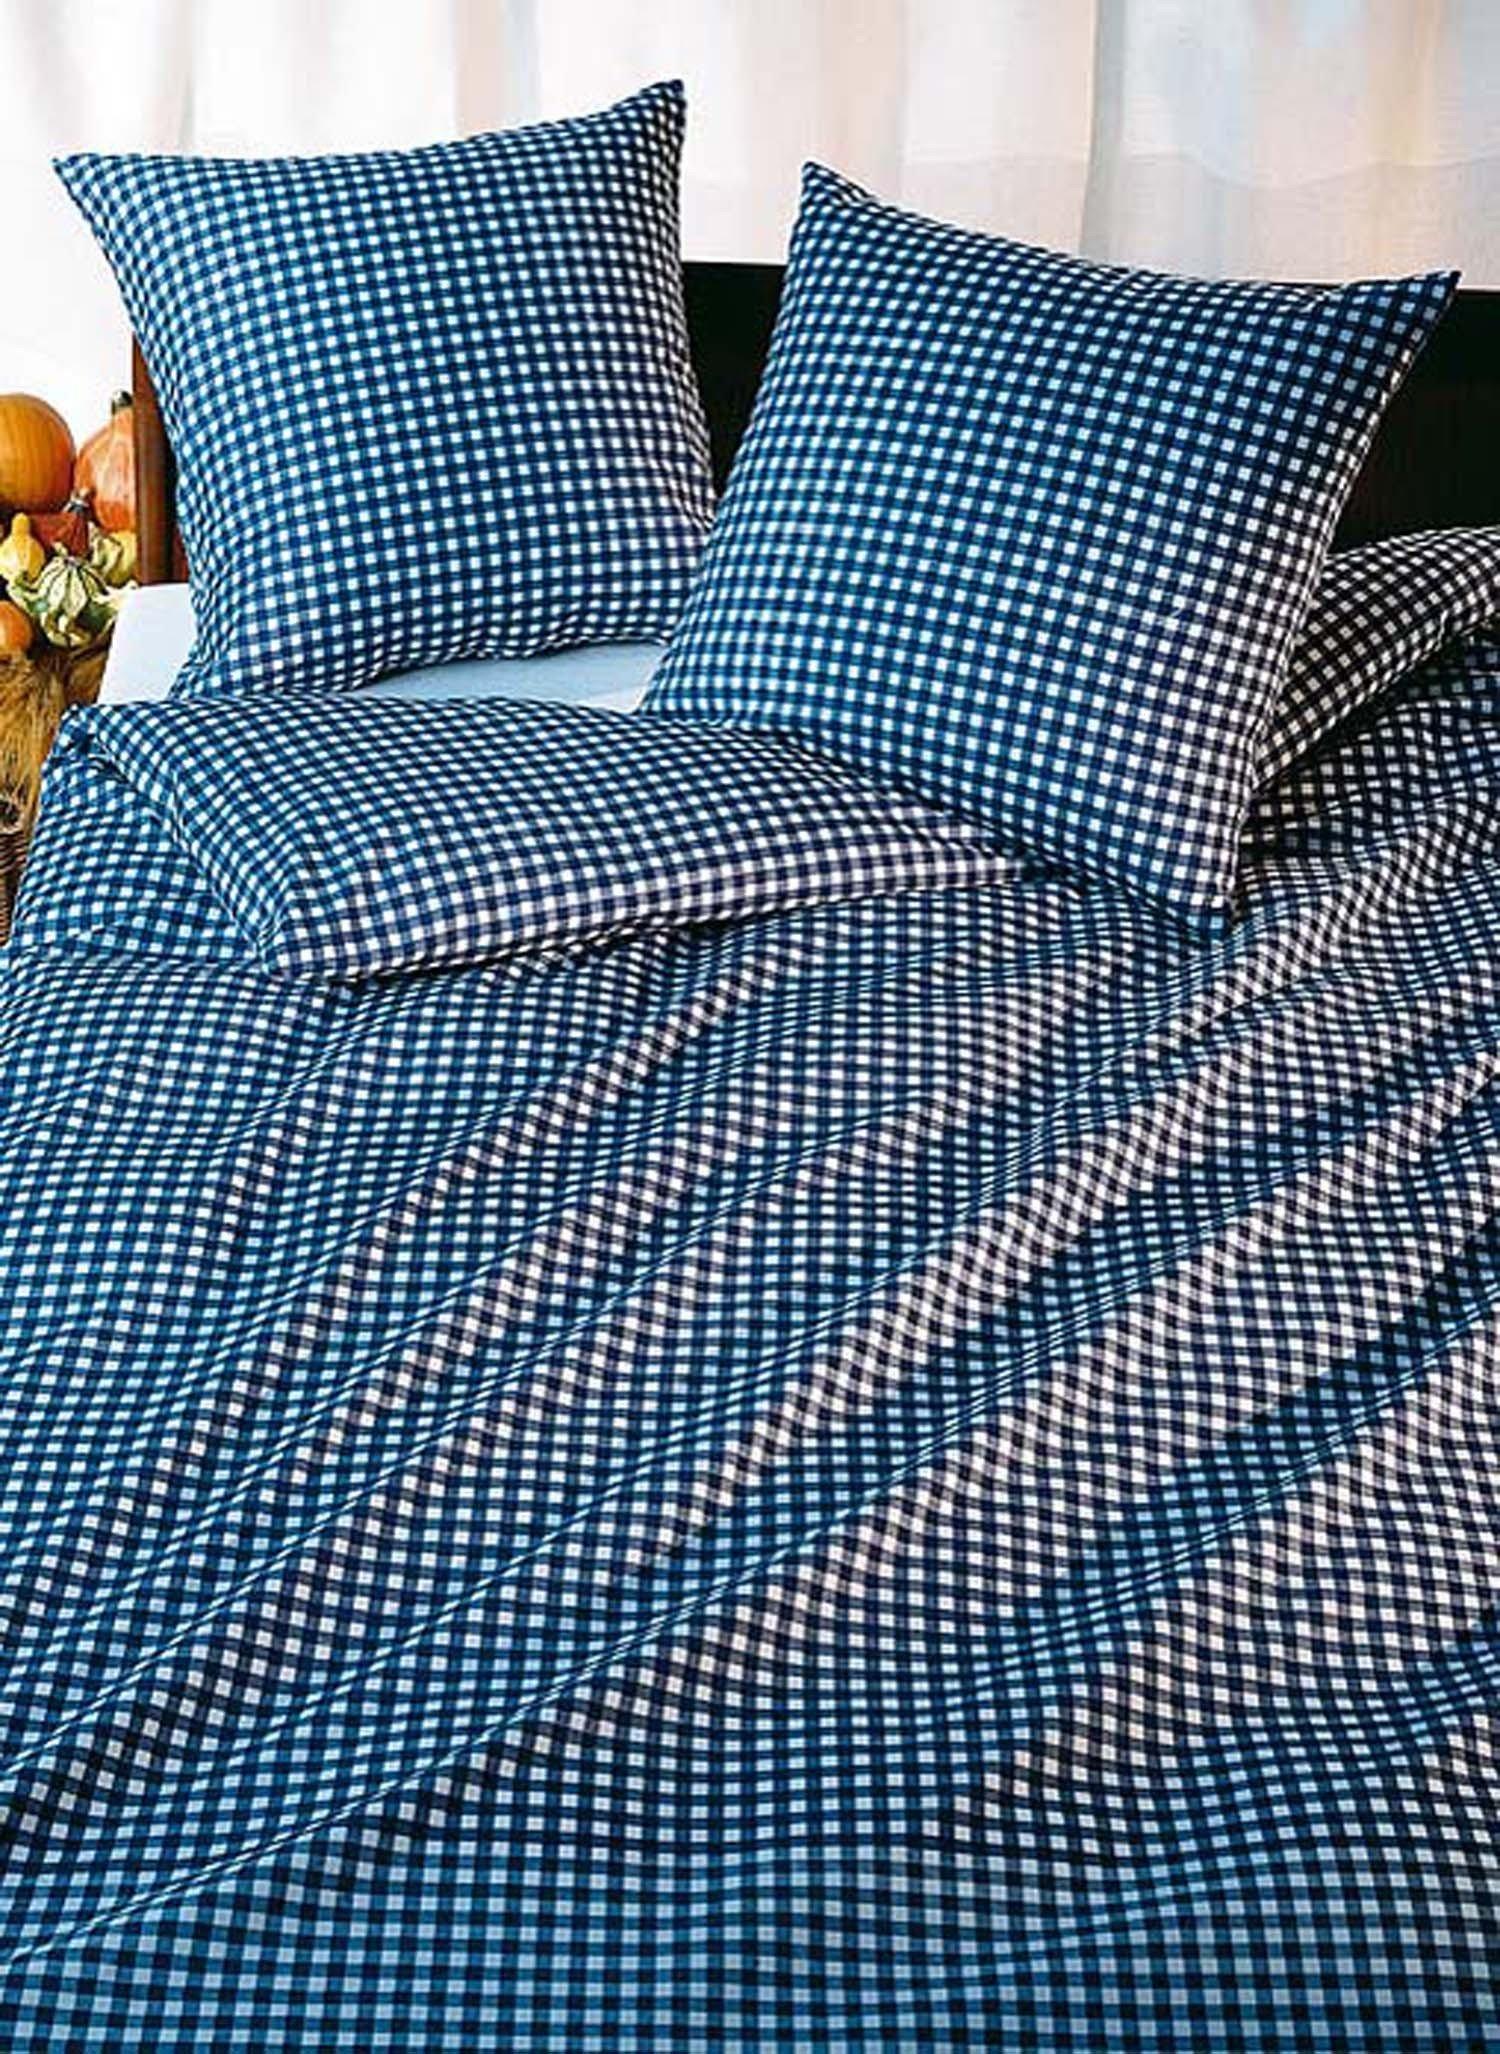 Garnitur DS Köl. blau/weiss 65x100+135x170cm - 1 - Ronja.ch